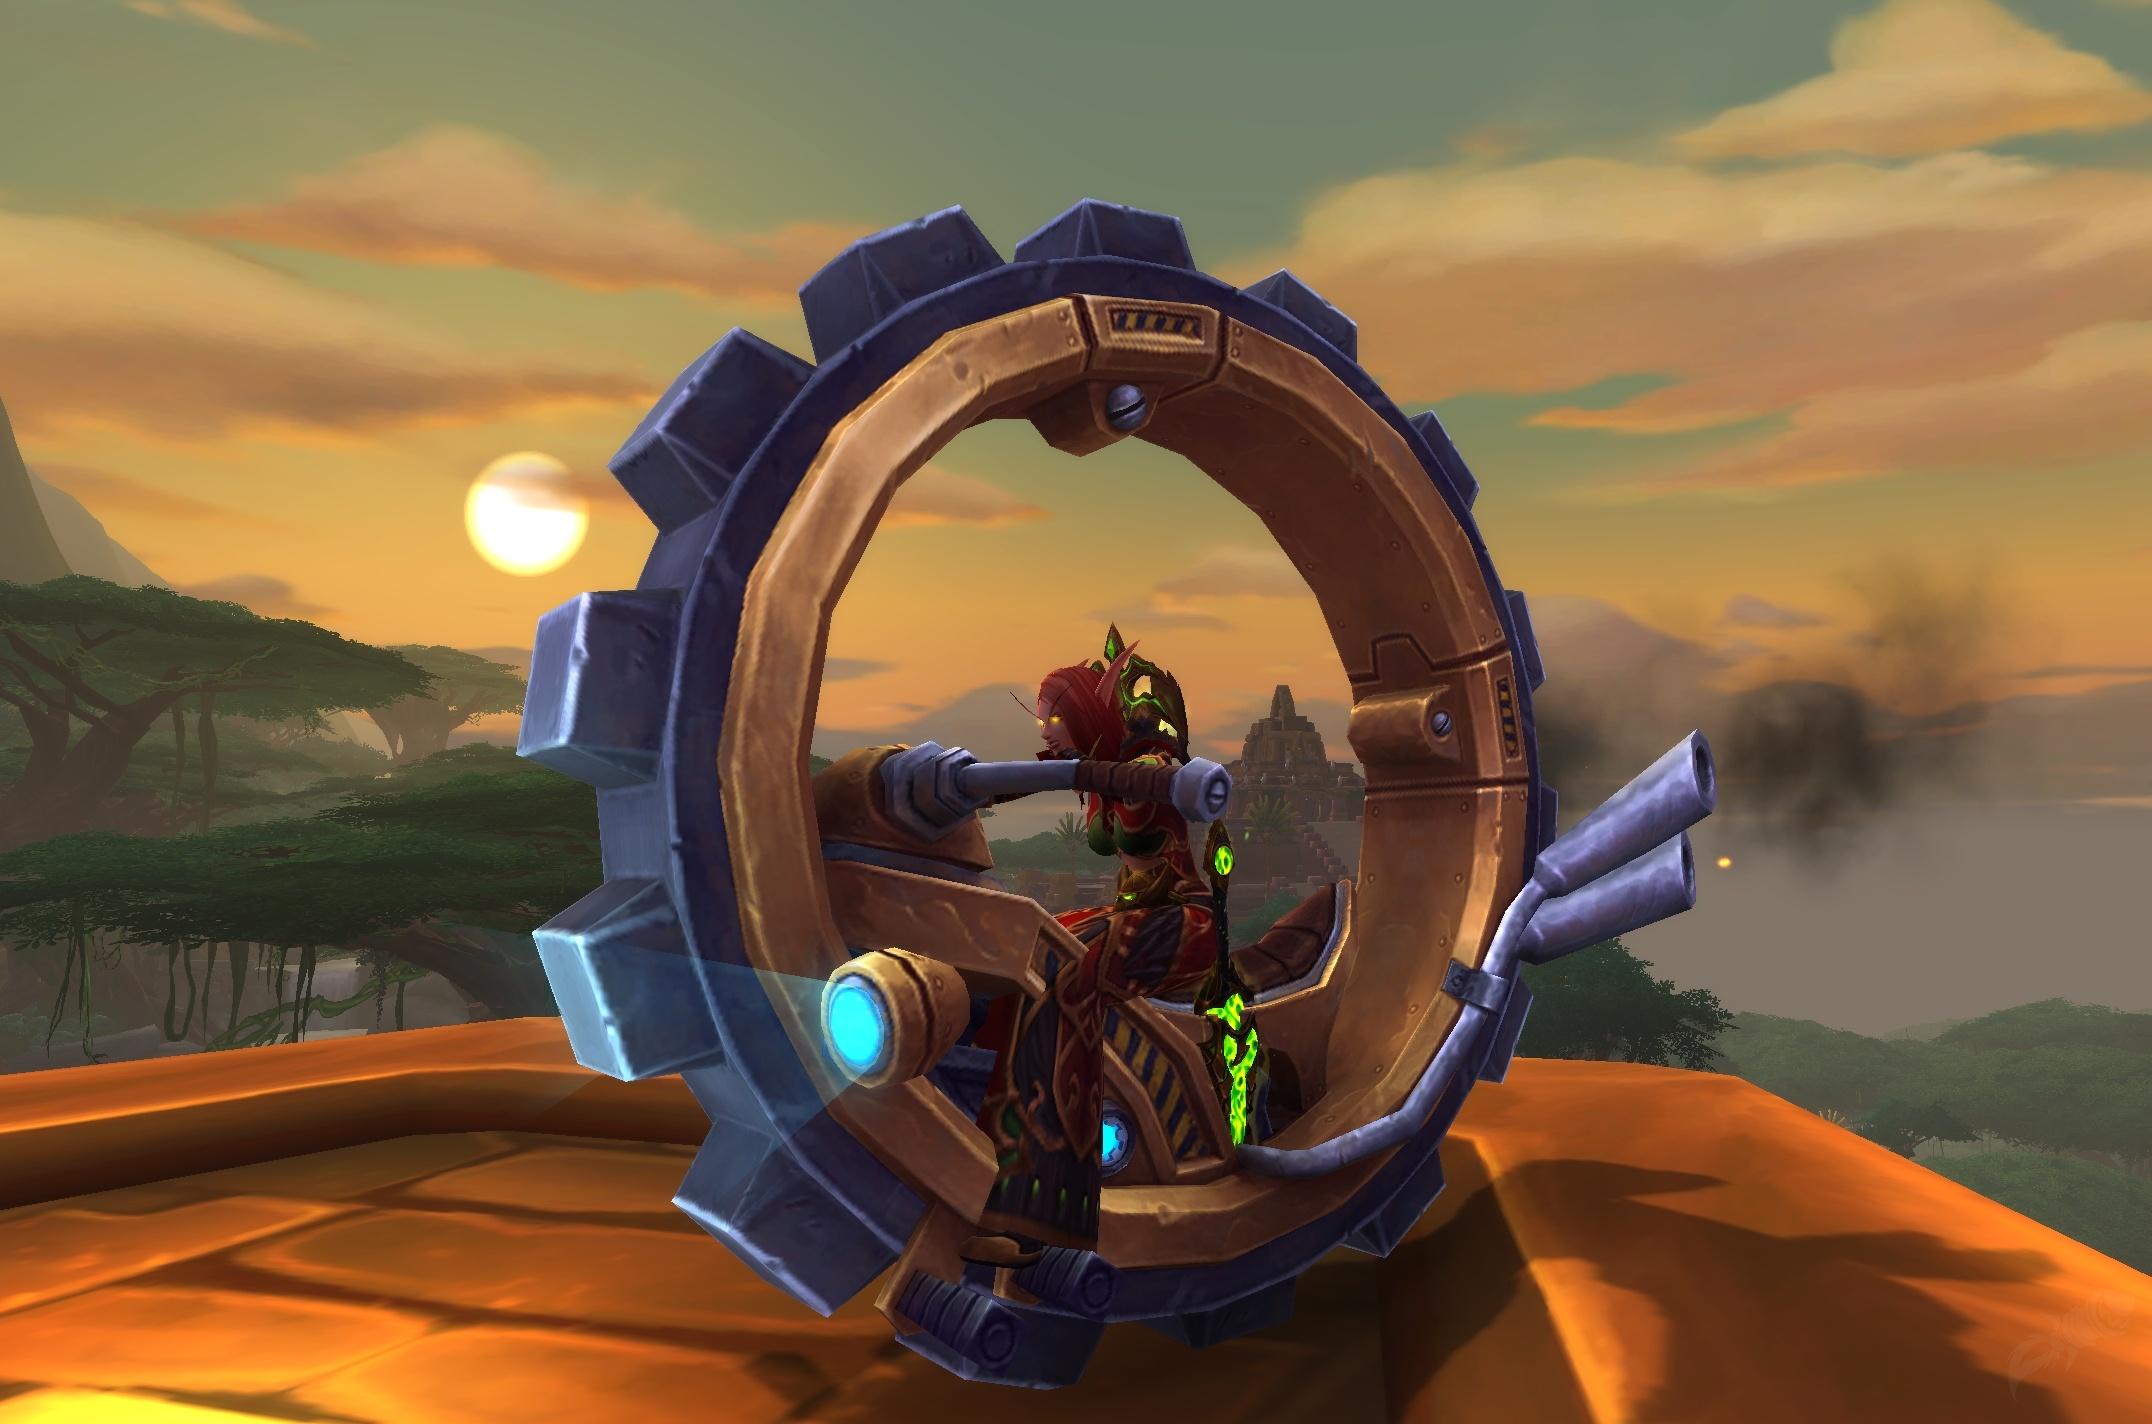 Keys to the Model W - Item - World of Warcraft